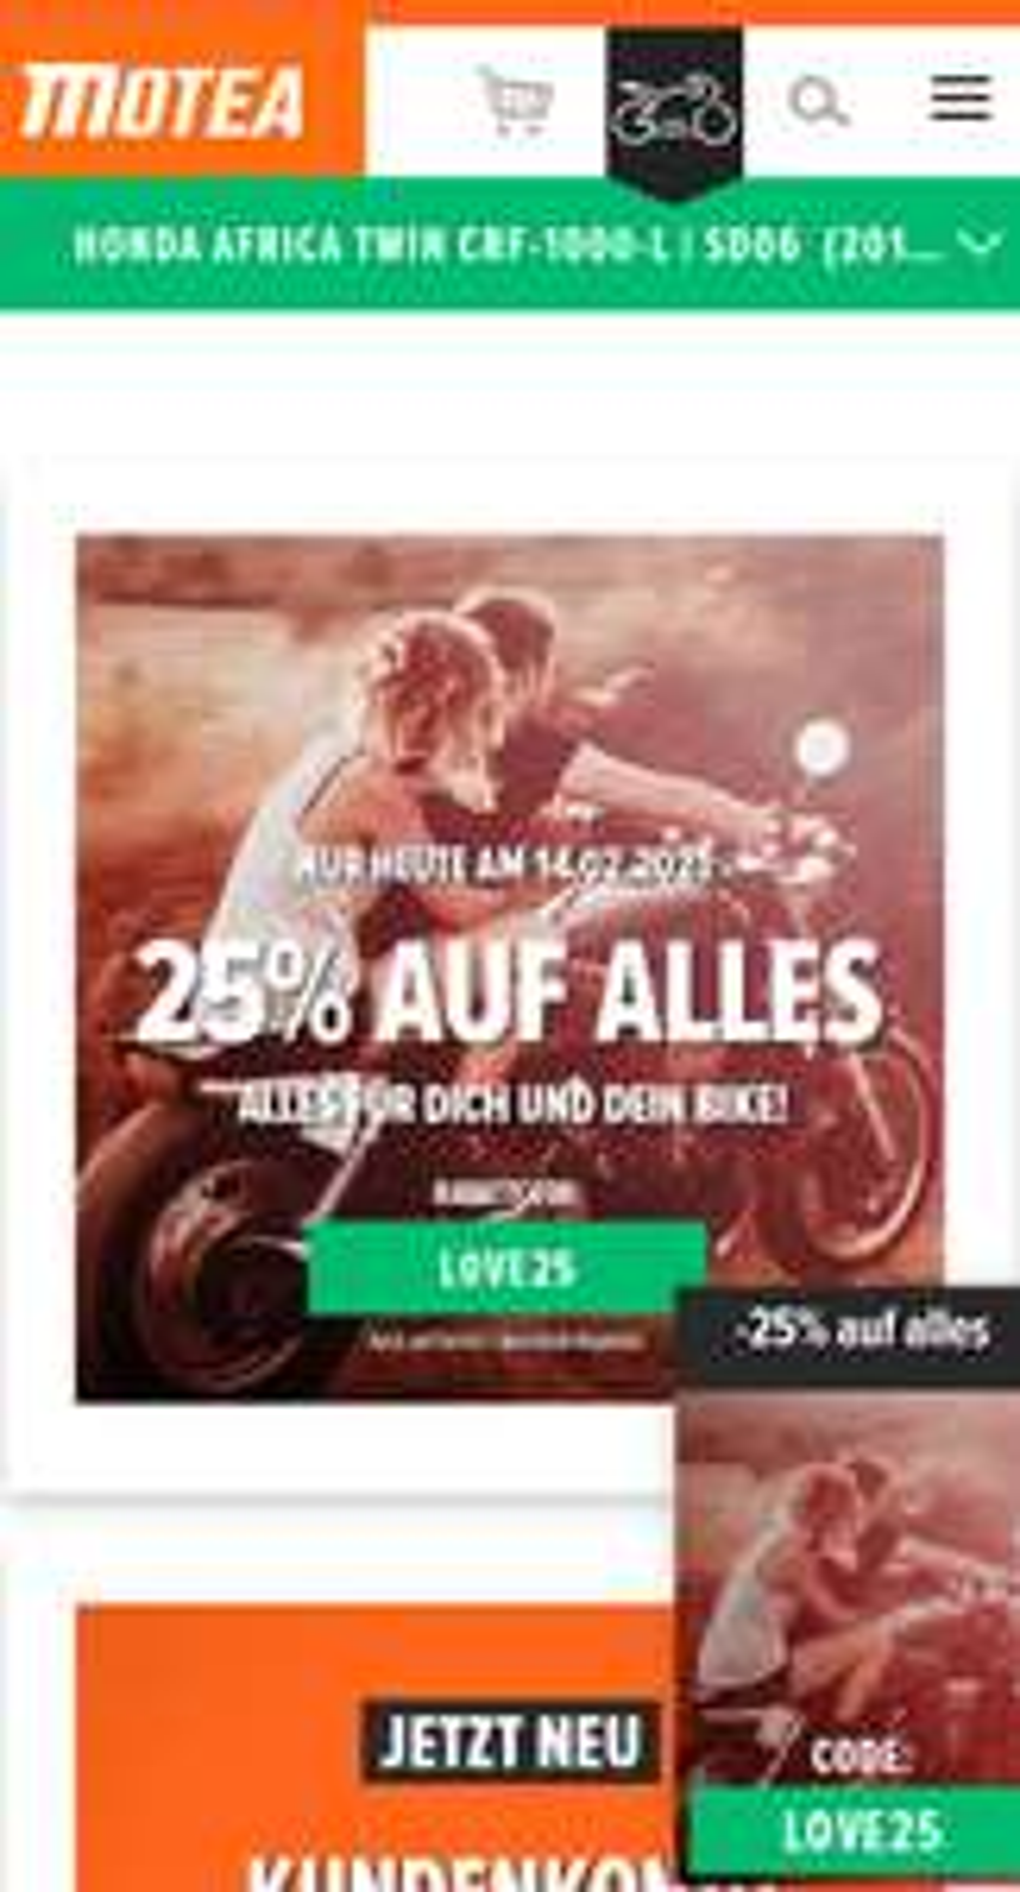 Motea - Motorrad Zubehör - 25% auf alles